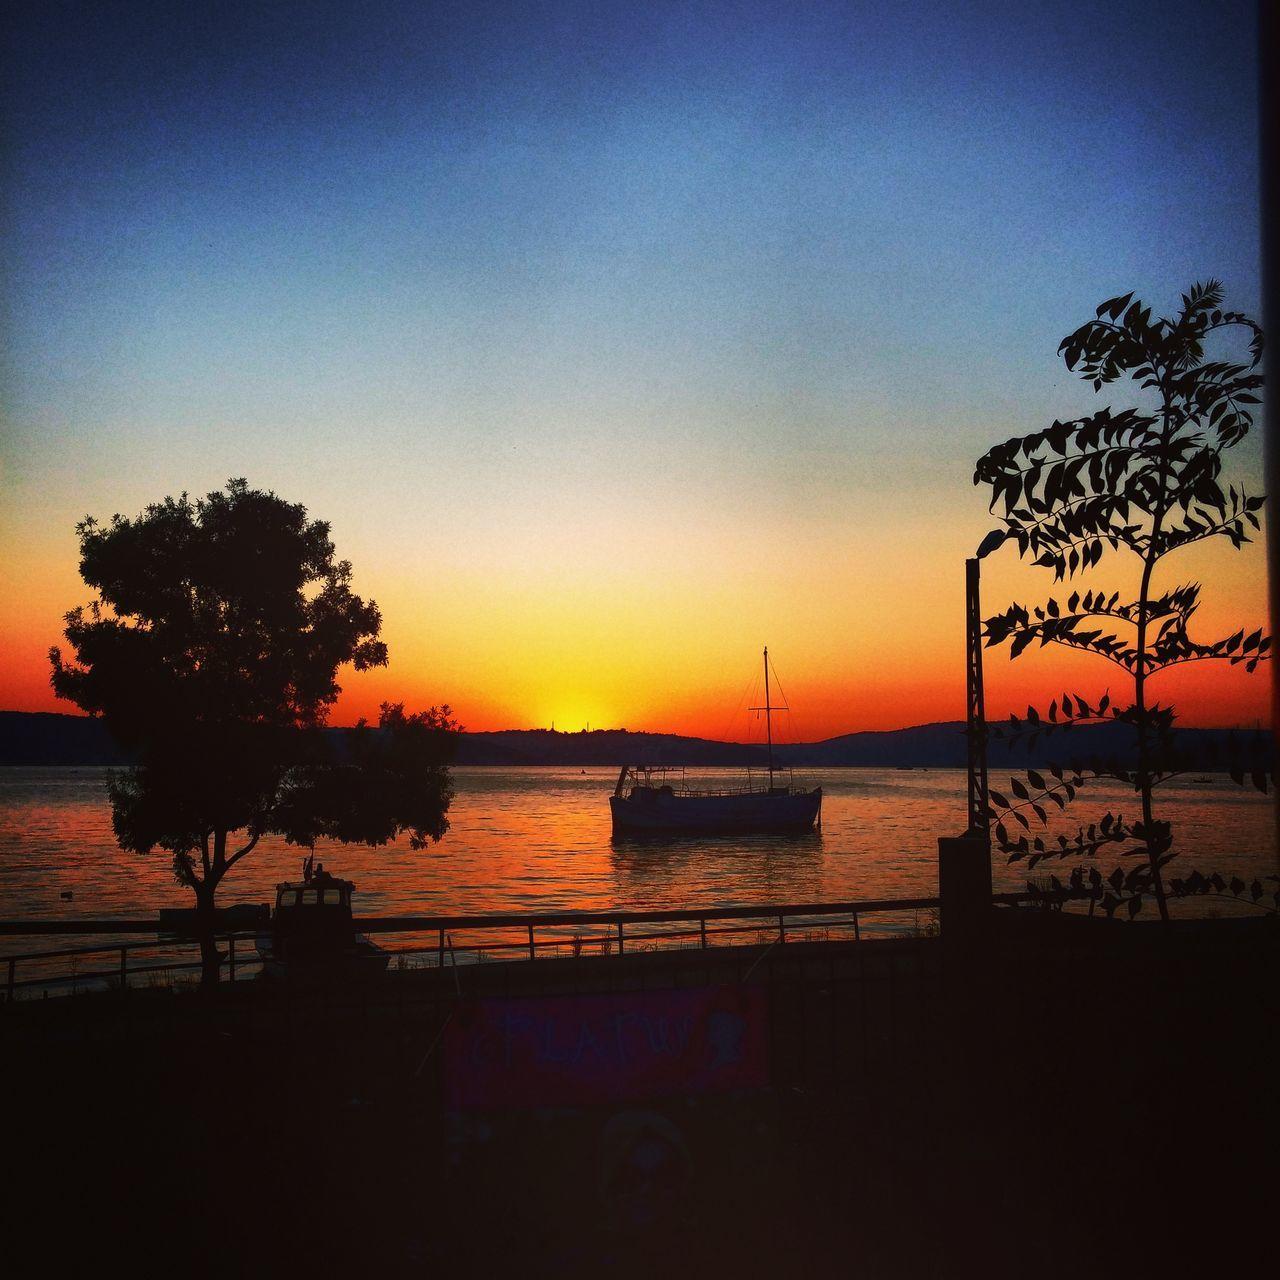 Sunset #sun #clouds #skylovers #sky #nature #beautifulinnature #naturalbeauty #photography #landscape Sunset✨trees✨